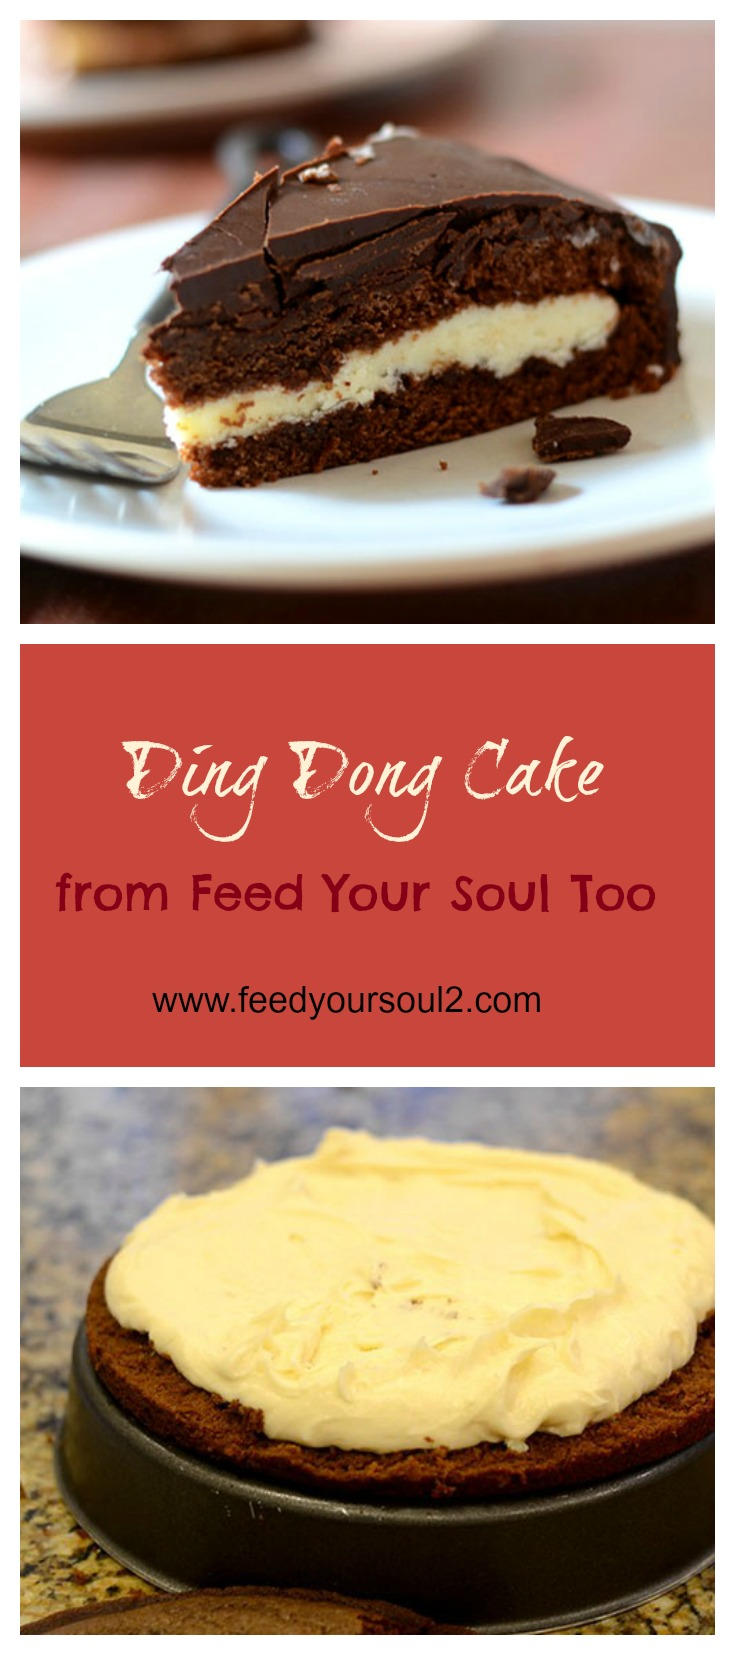 Ding Dong Cake #dessert #chocolate #childhoodclassic | feedyoursoul2.com